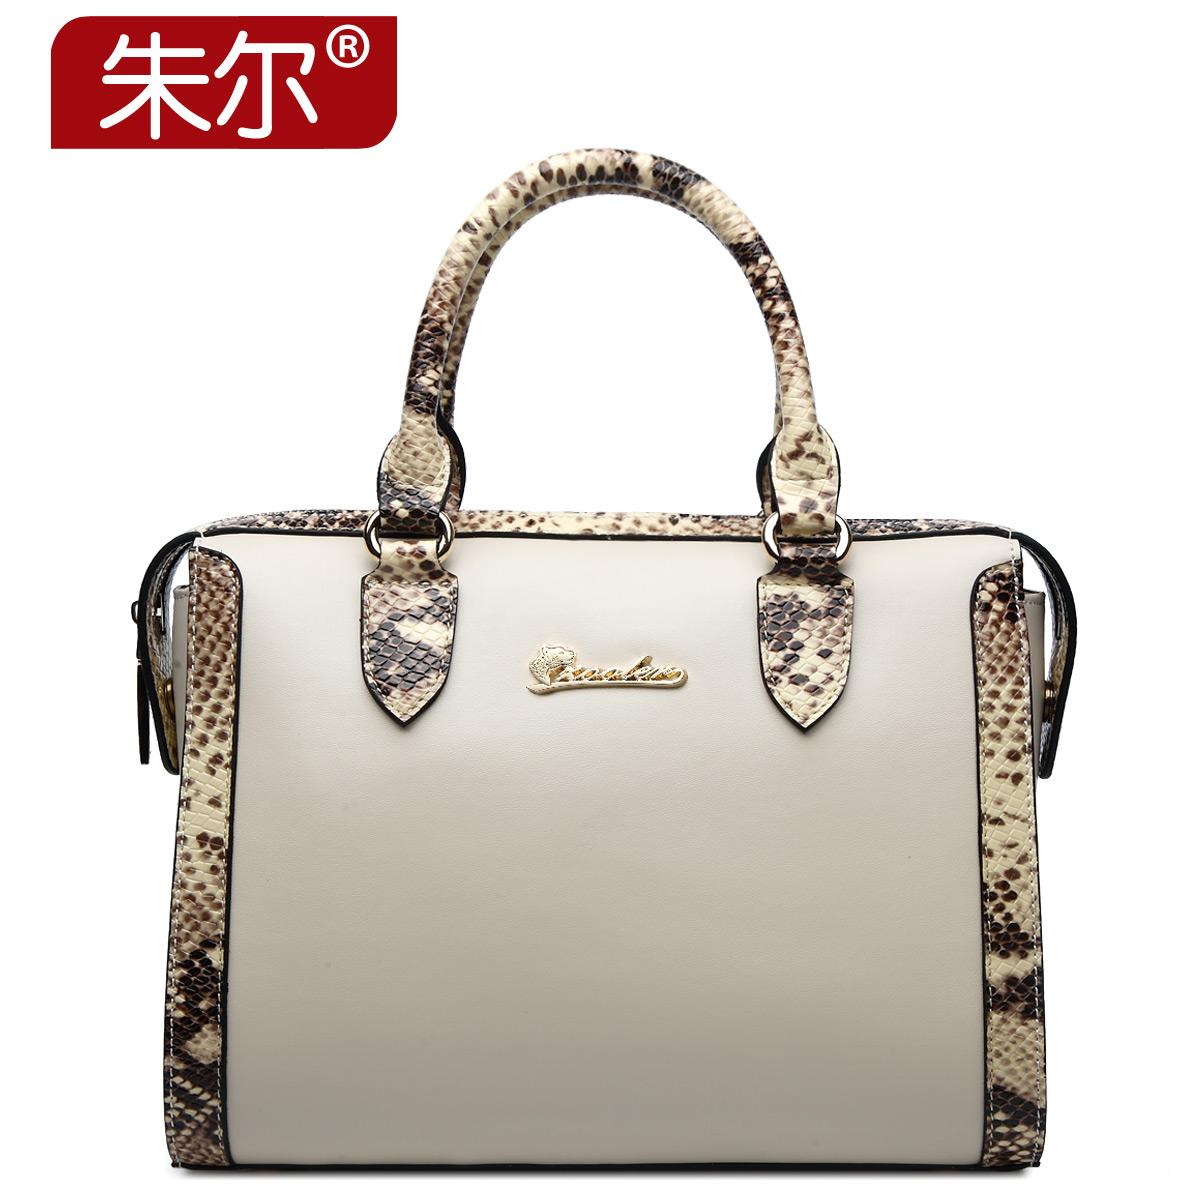 Autumn new arrival 2015 cowhide women's handbag solid color serpentine pattern fashion women's bags one shoulder handbag female